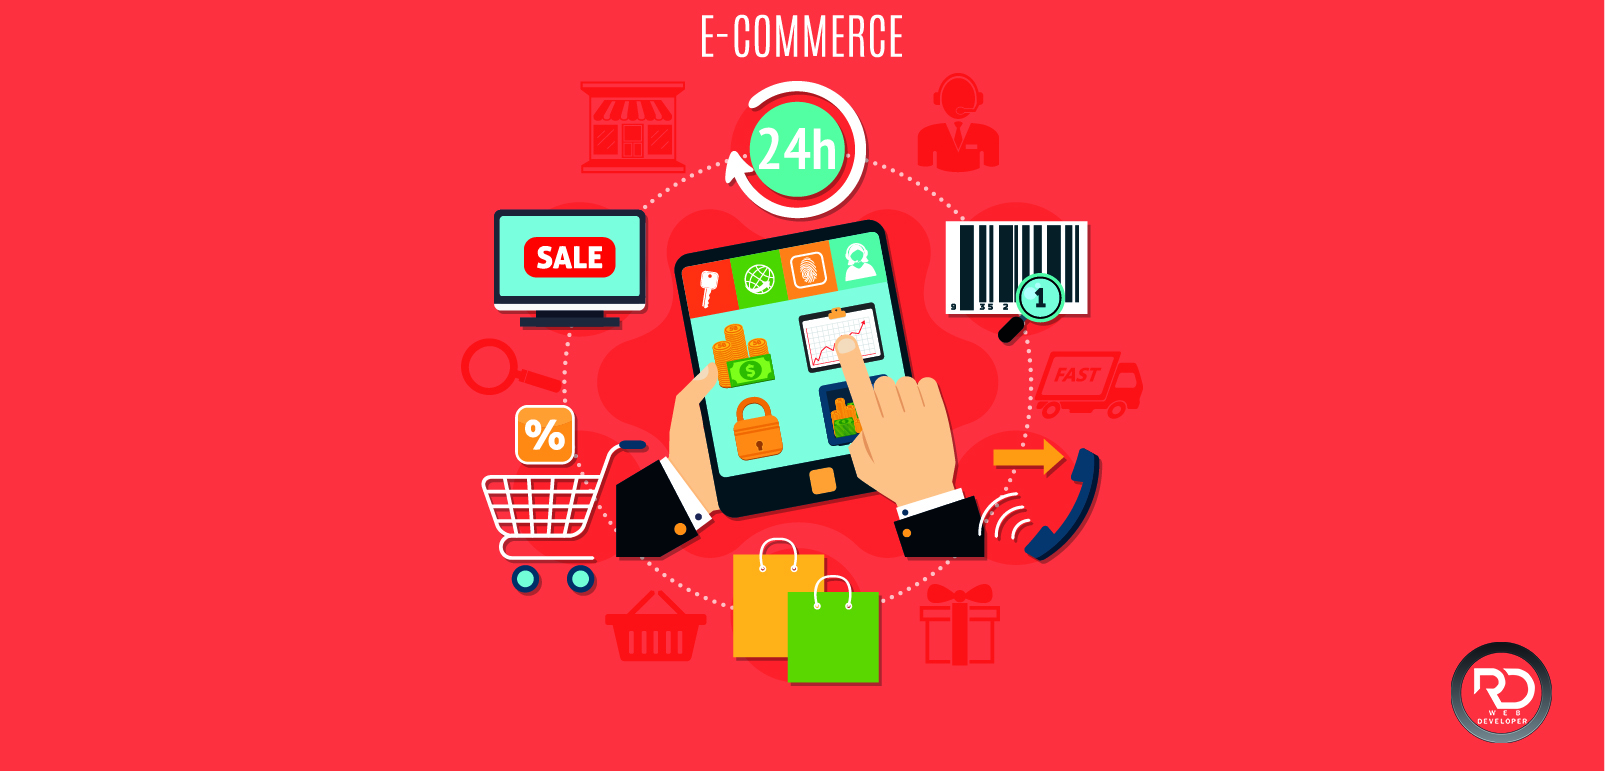 eCommerce advantages